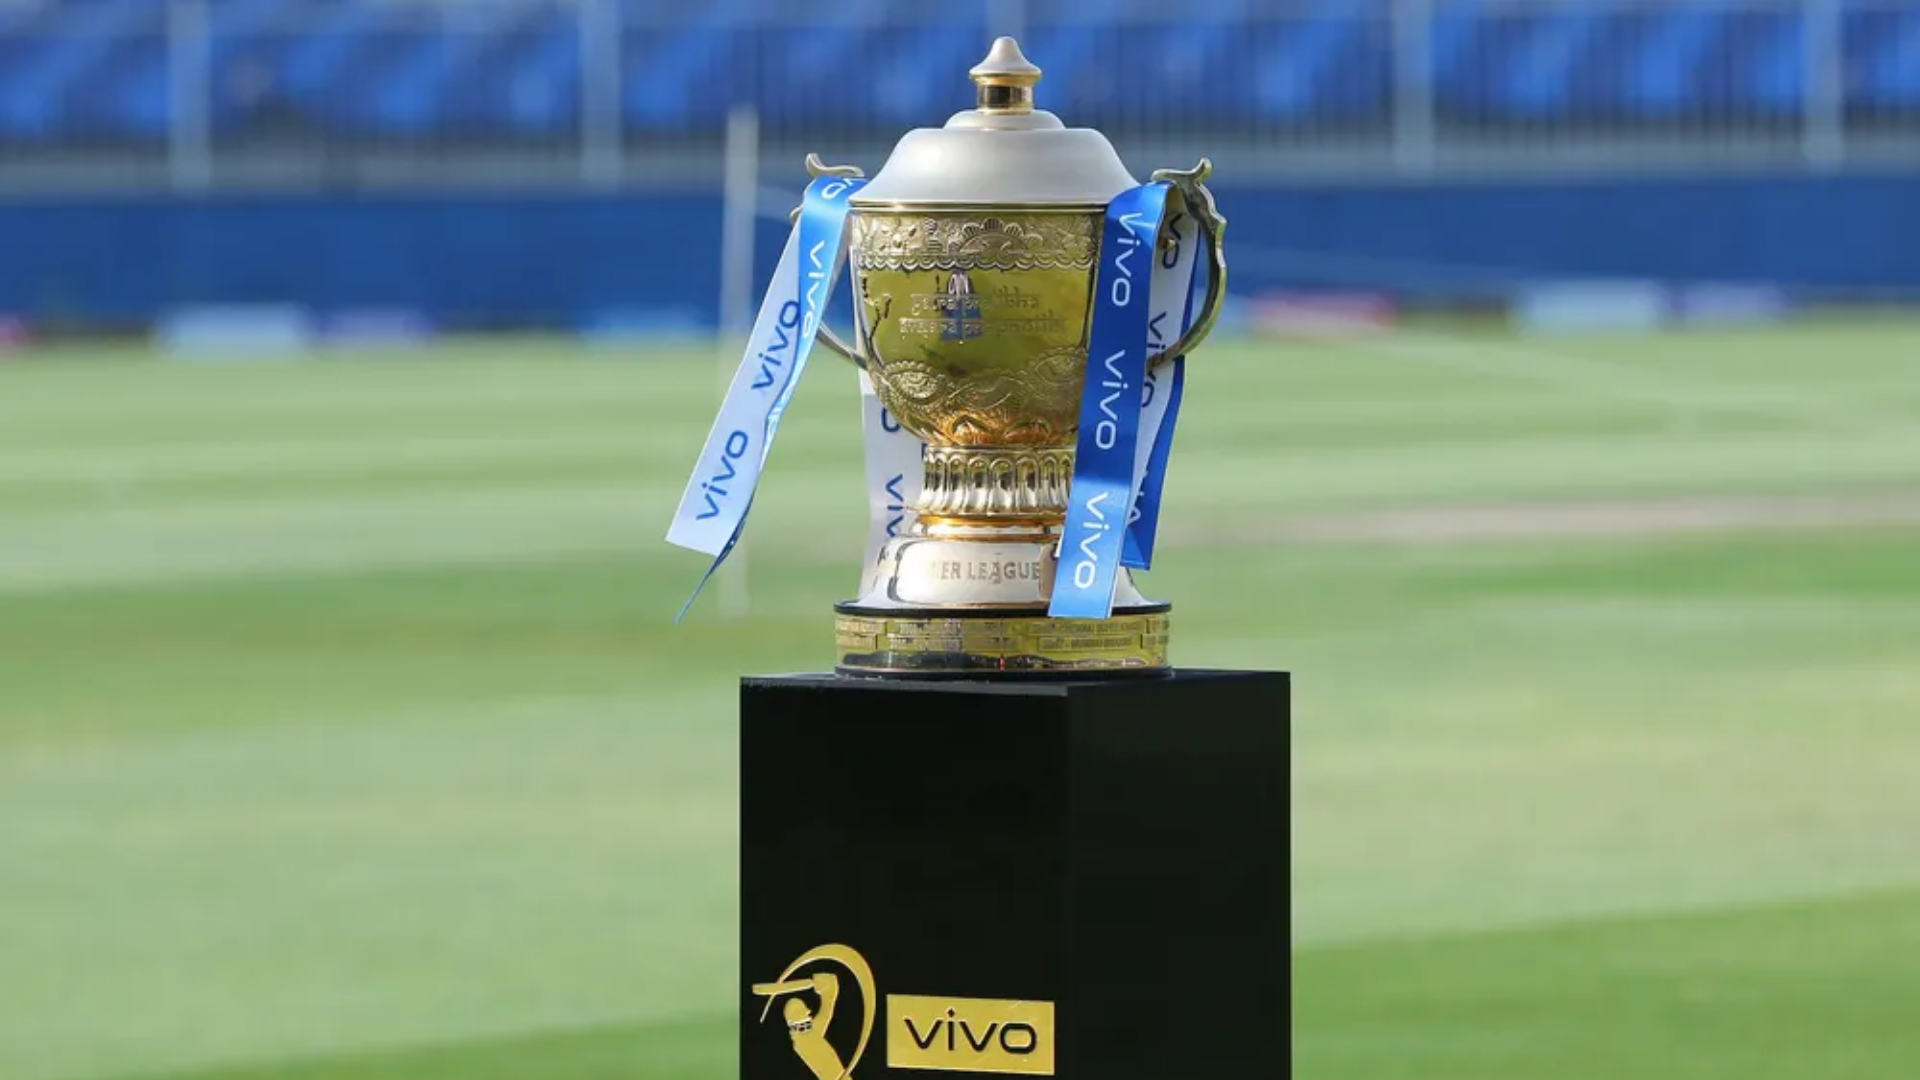 2 new IPL Teams announced